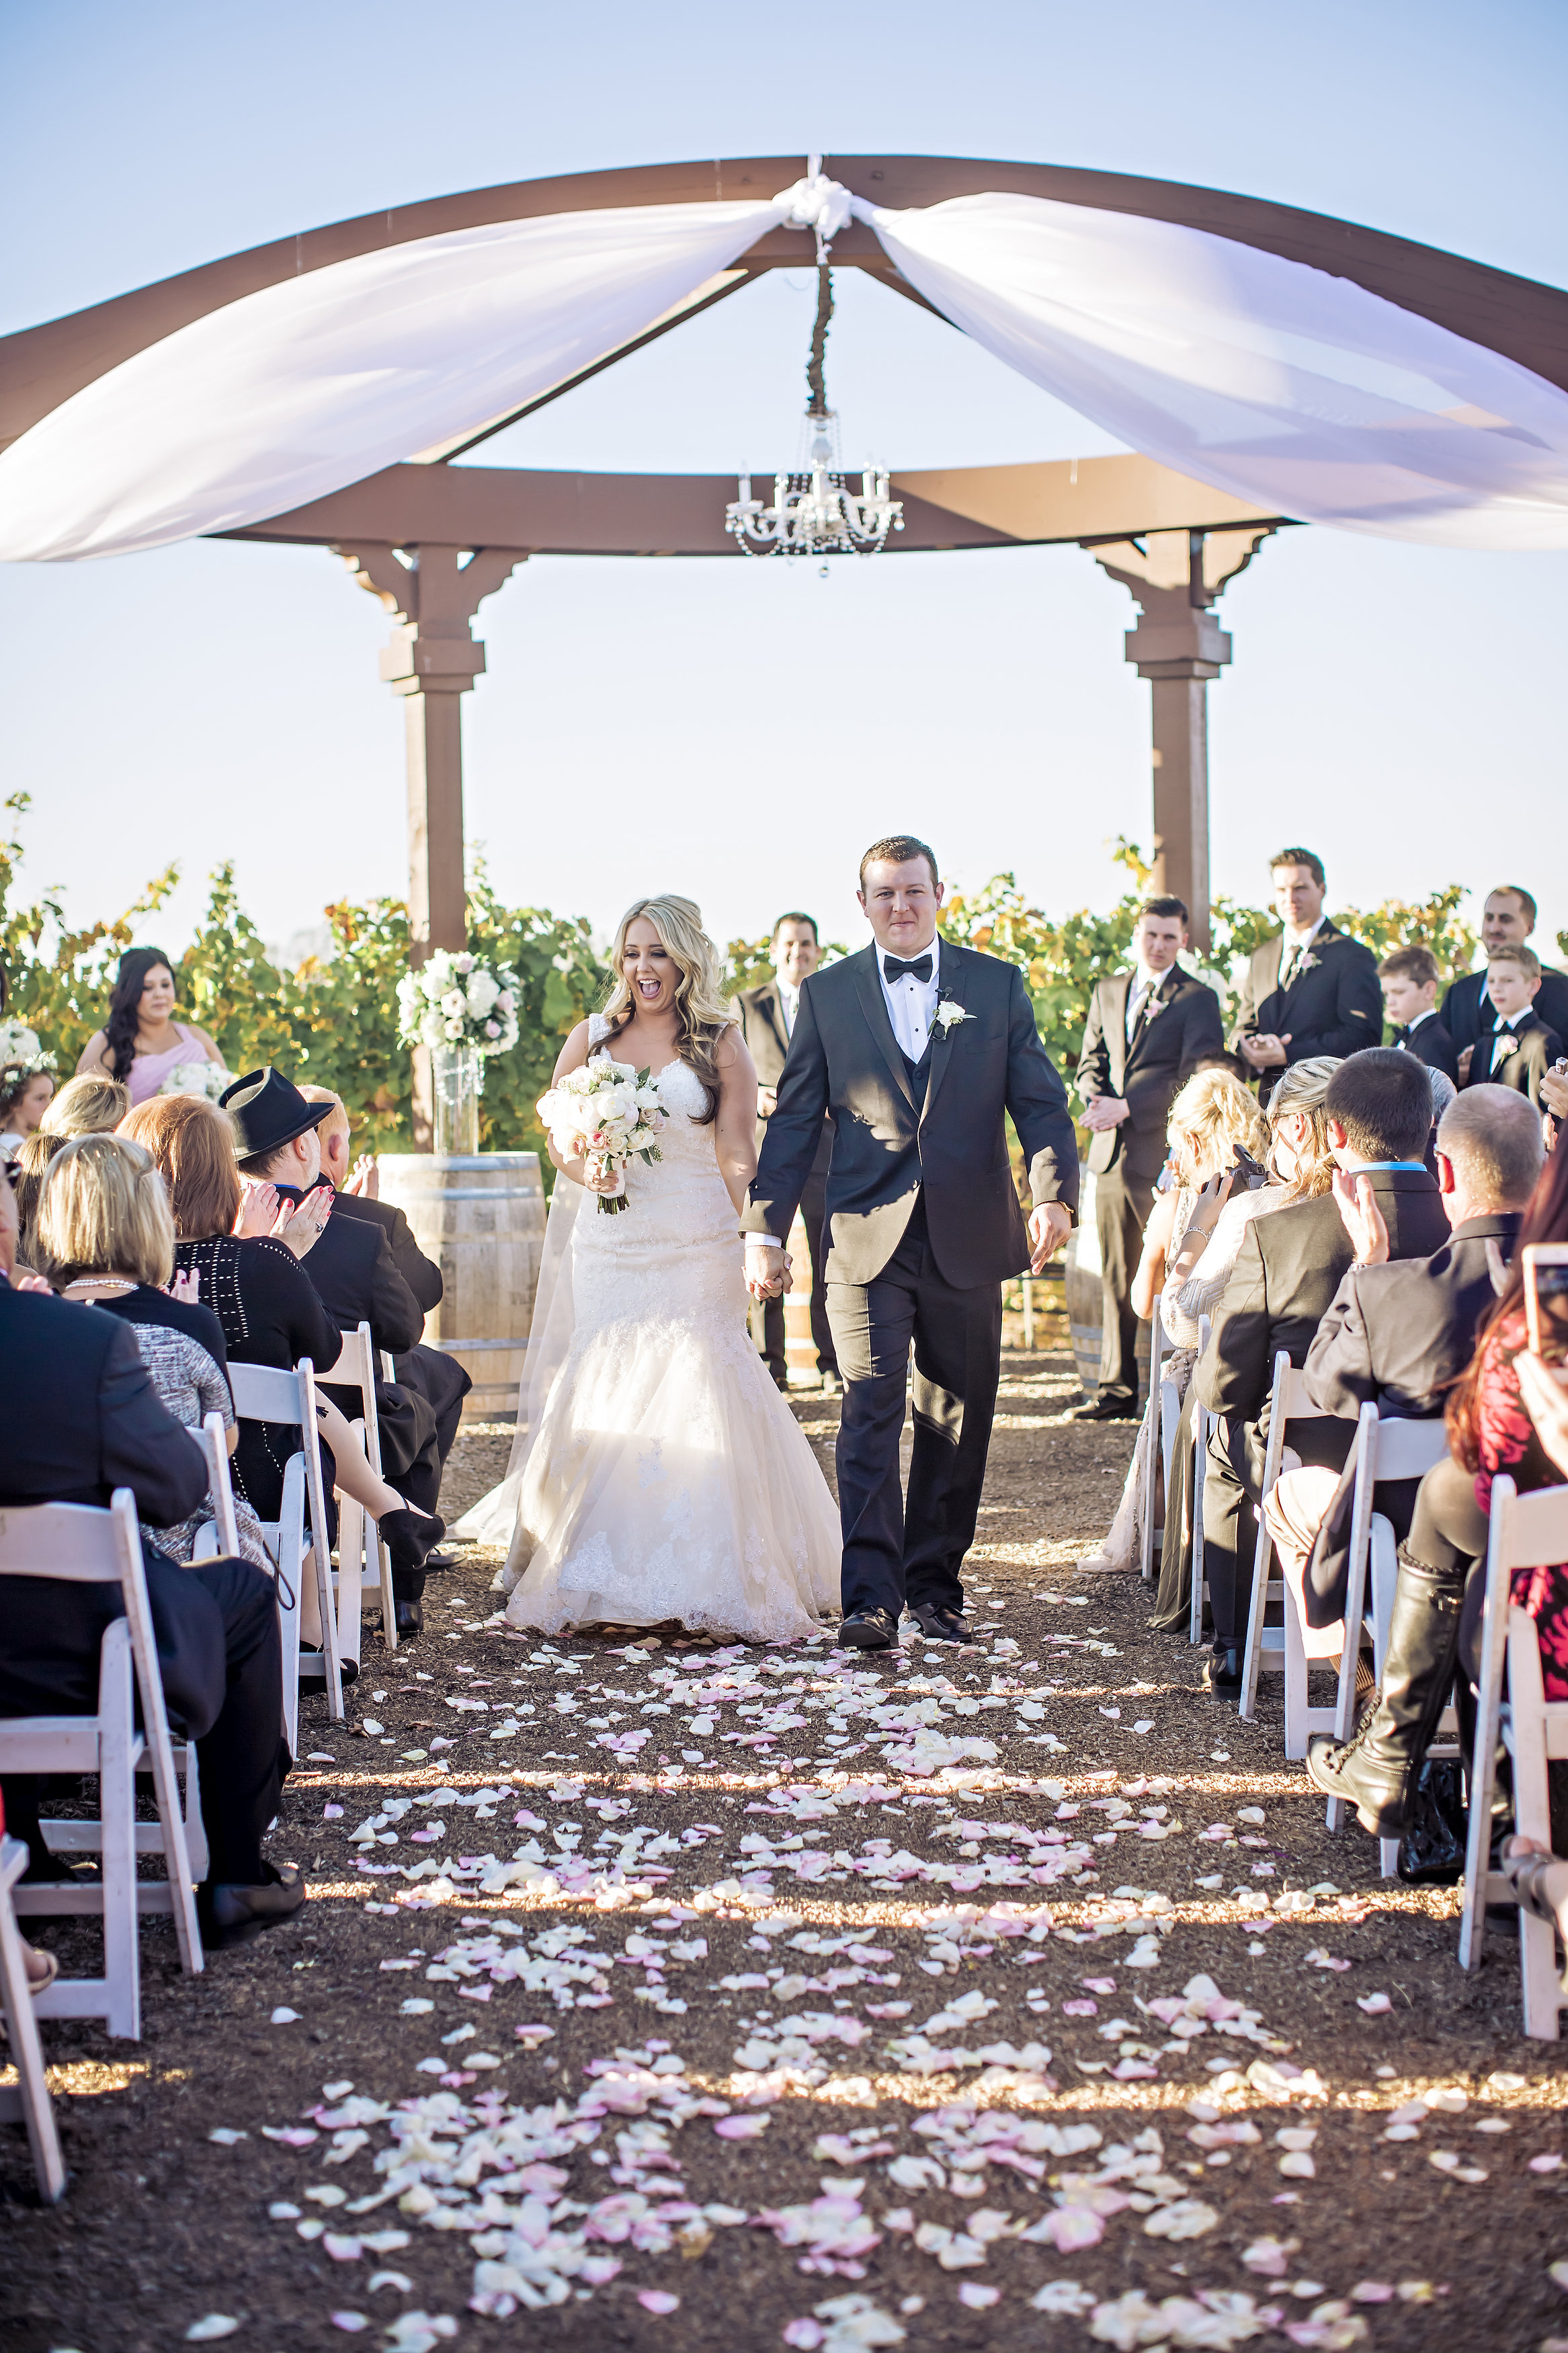 Merlot Mesa Blush and White Wedding Ceremony | Temecula Private Estate Wedding | Michelle Garibay Events